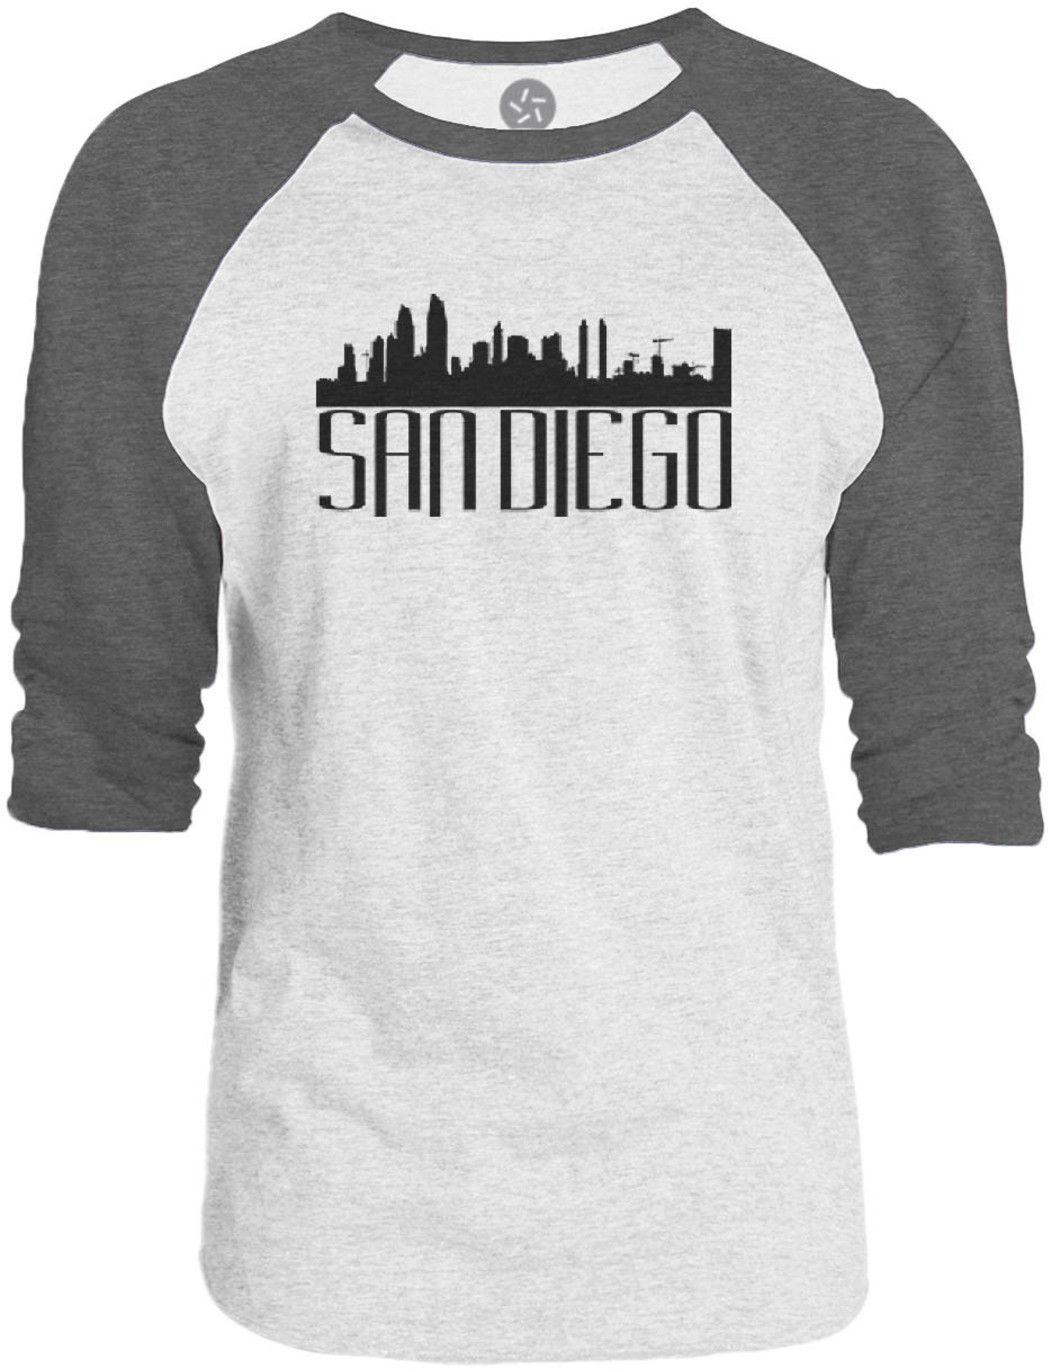 Big Texas San Diego Skyline (Black) 3/4-Sleeve Raglan Baseball T-Shirt